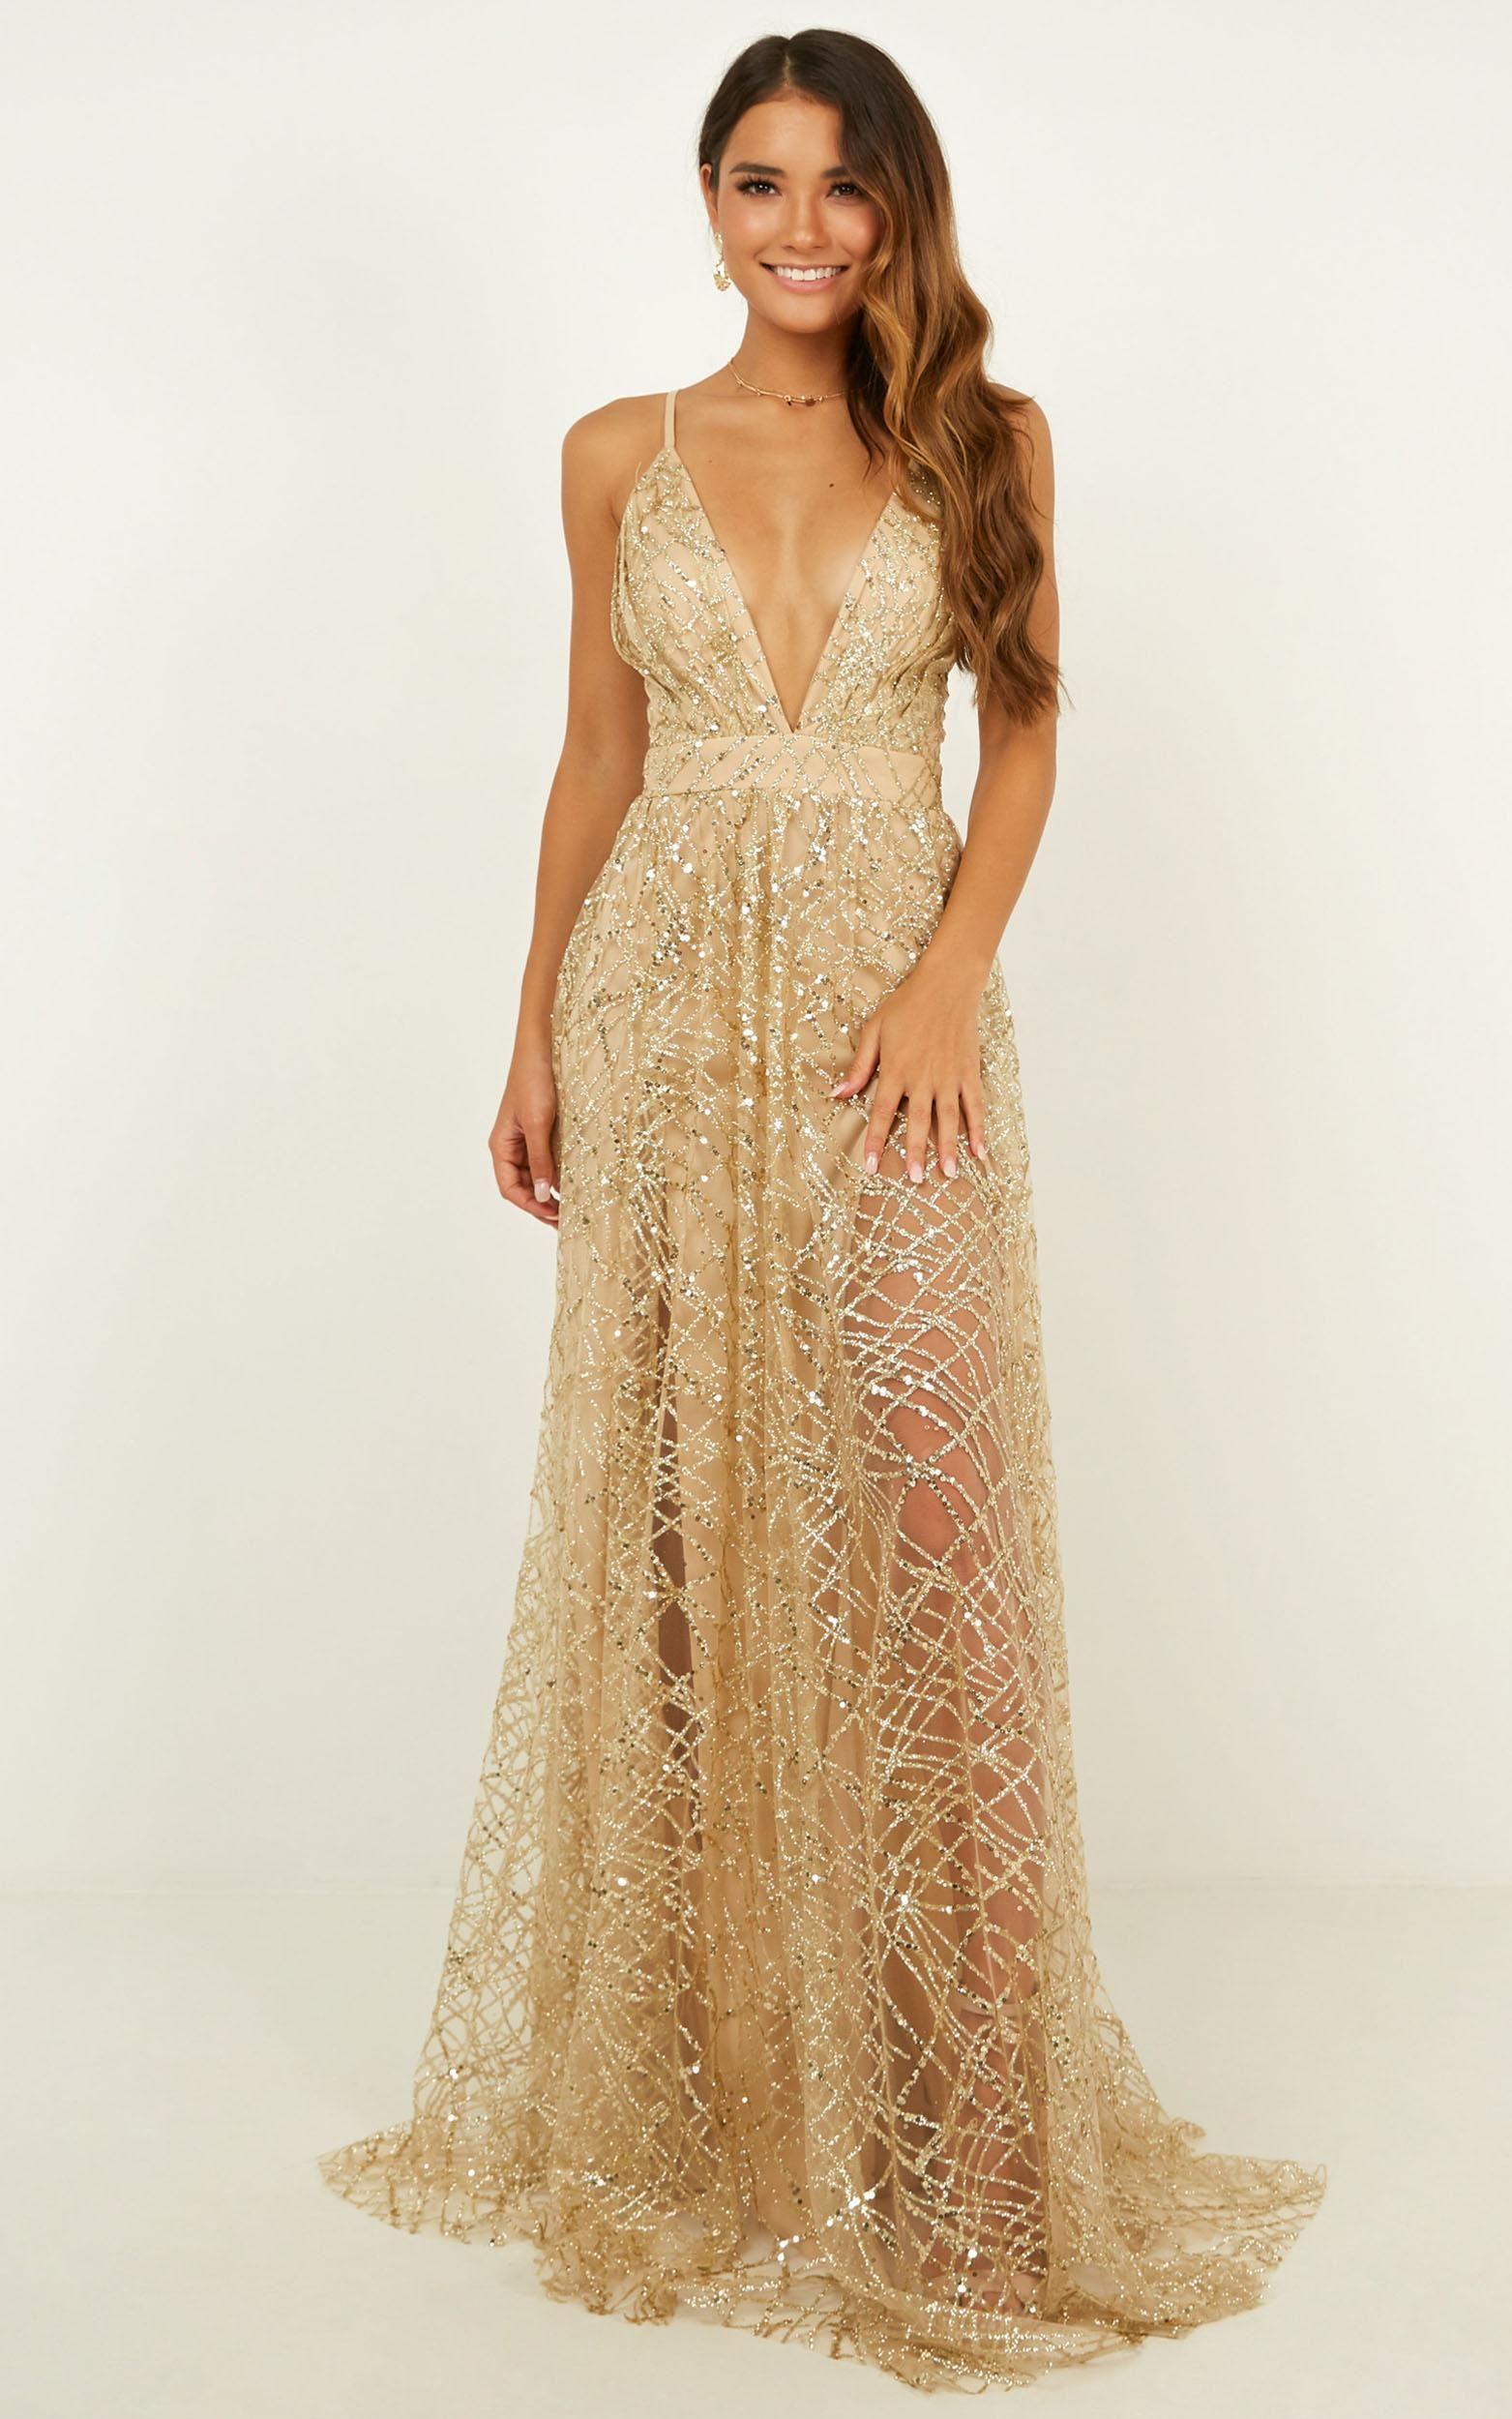 Eternal Sunshine Maxi Dress In Gold Sequin Tulle Showpo Dresses Maxi Dress Dusty Blue Bridesmaid Dresses [ 2500 x 1563 Pixel ]